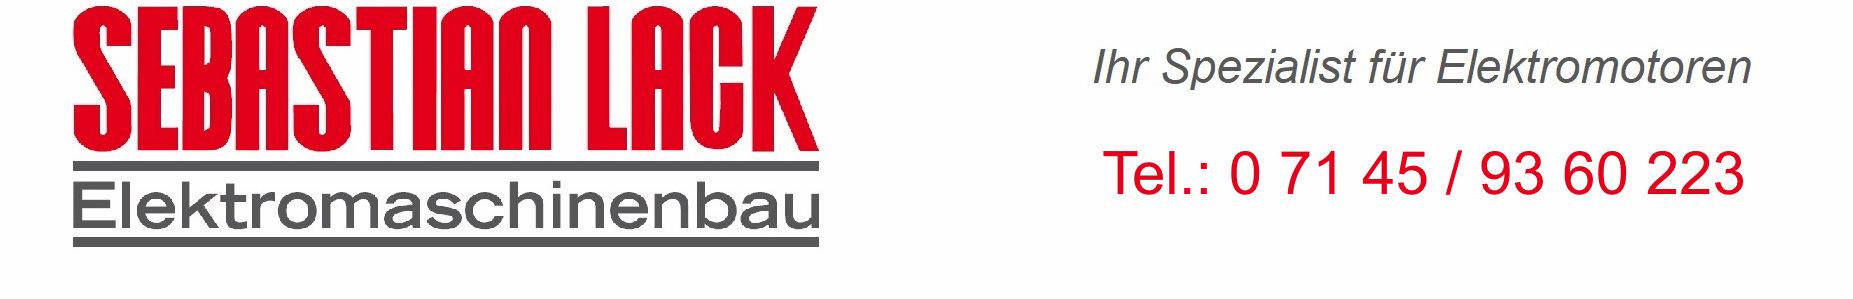 Sebastian Lack GmbH